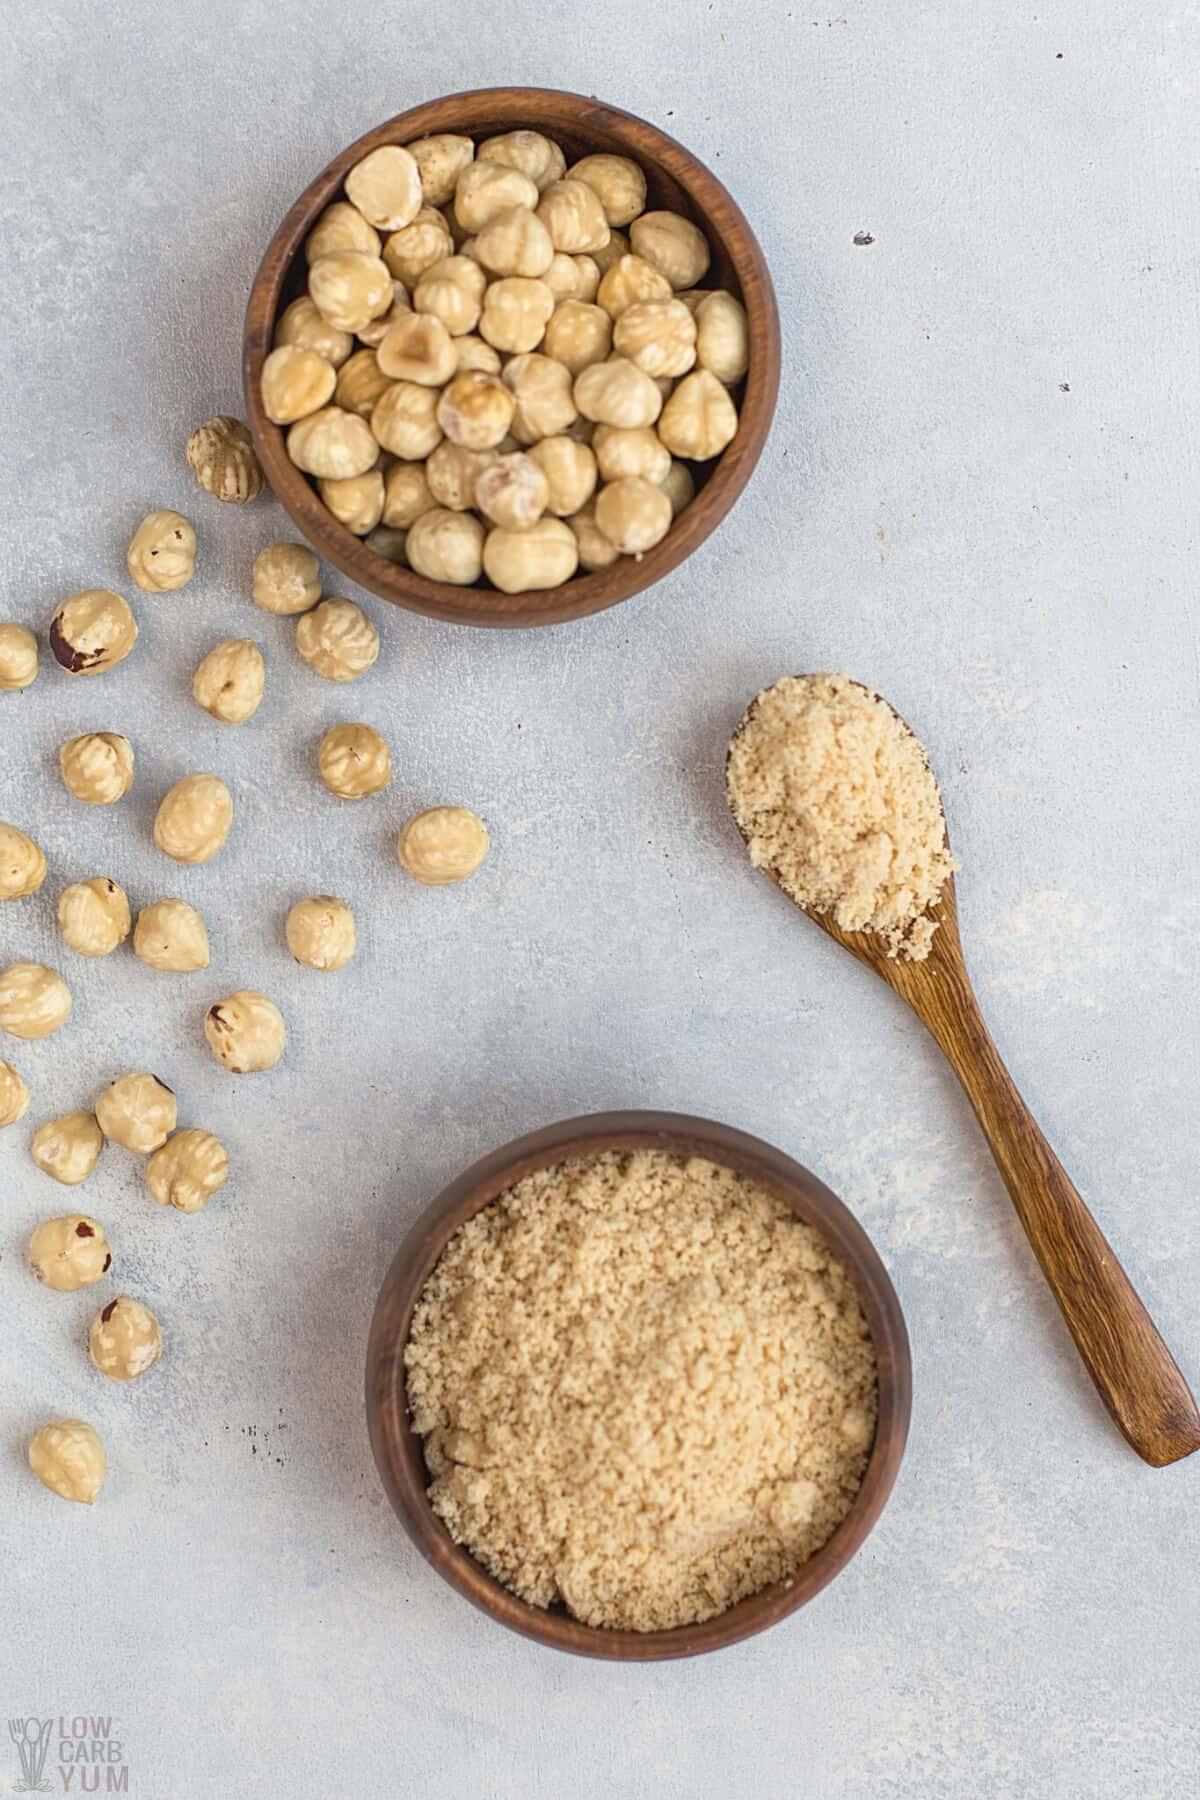 hazelnut nuts flour bowls spoon